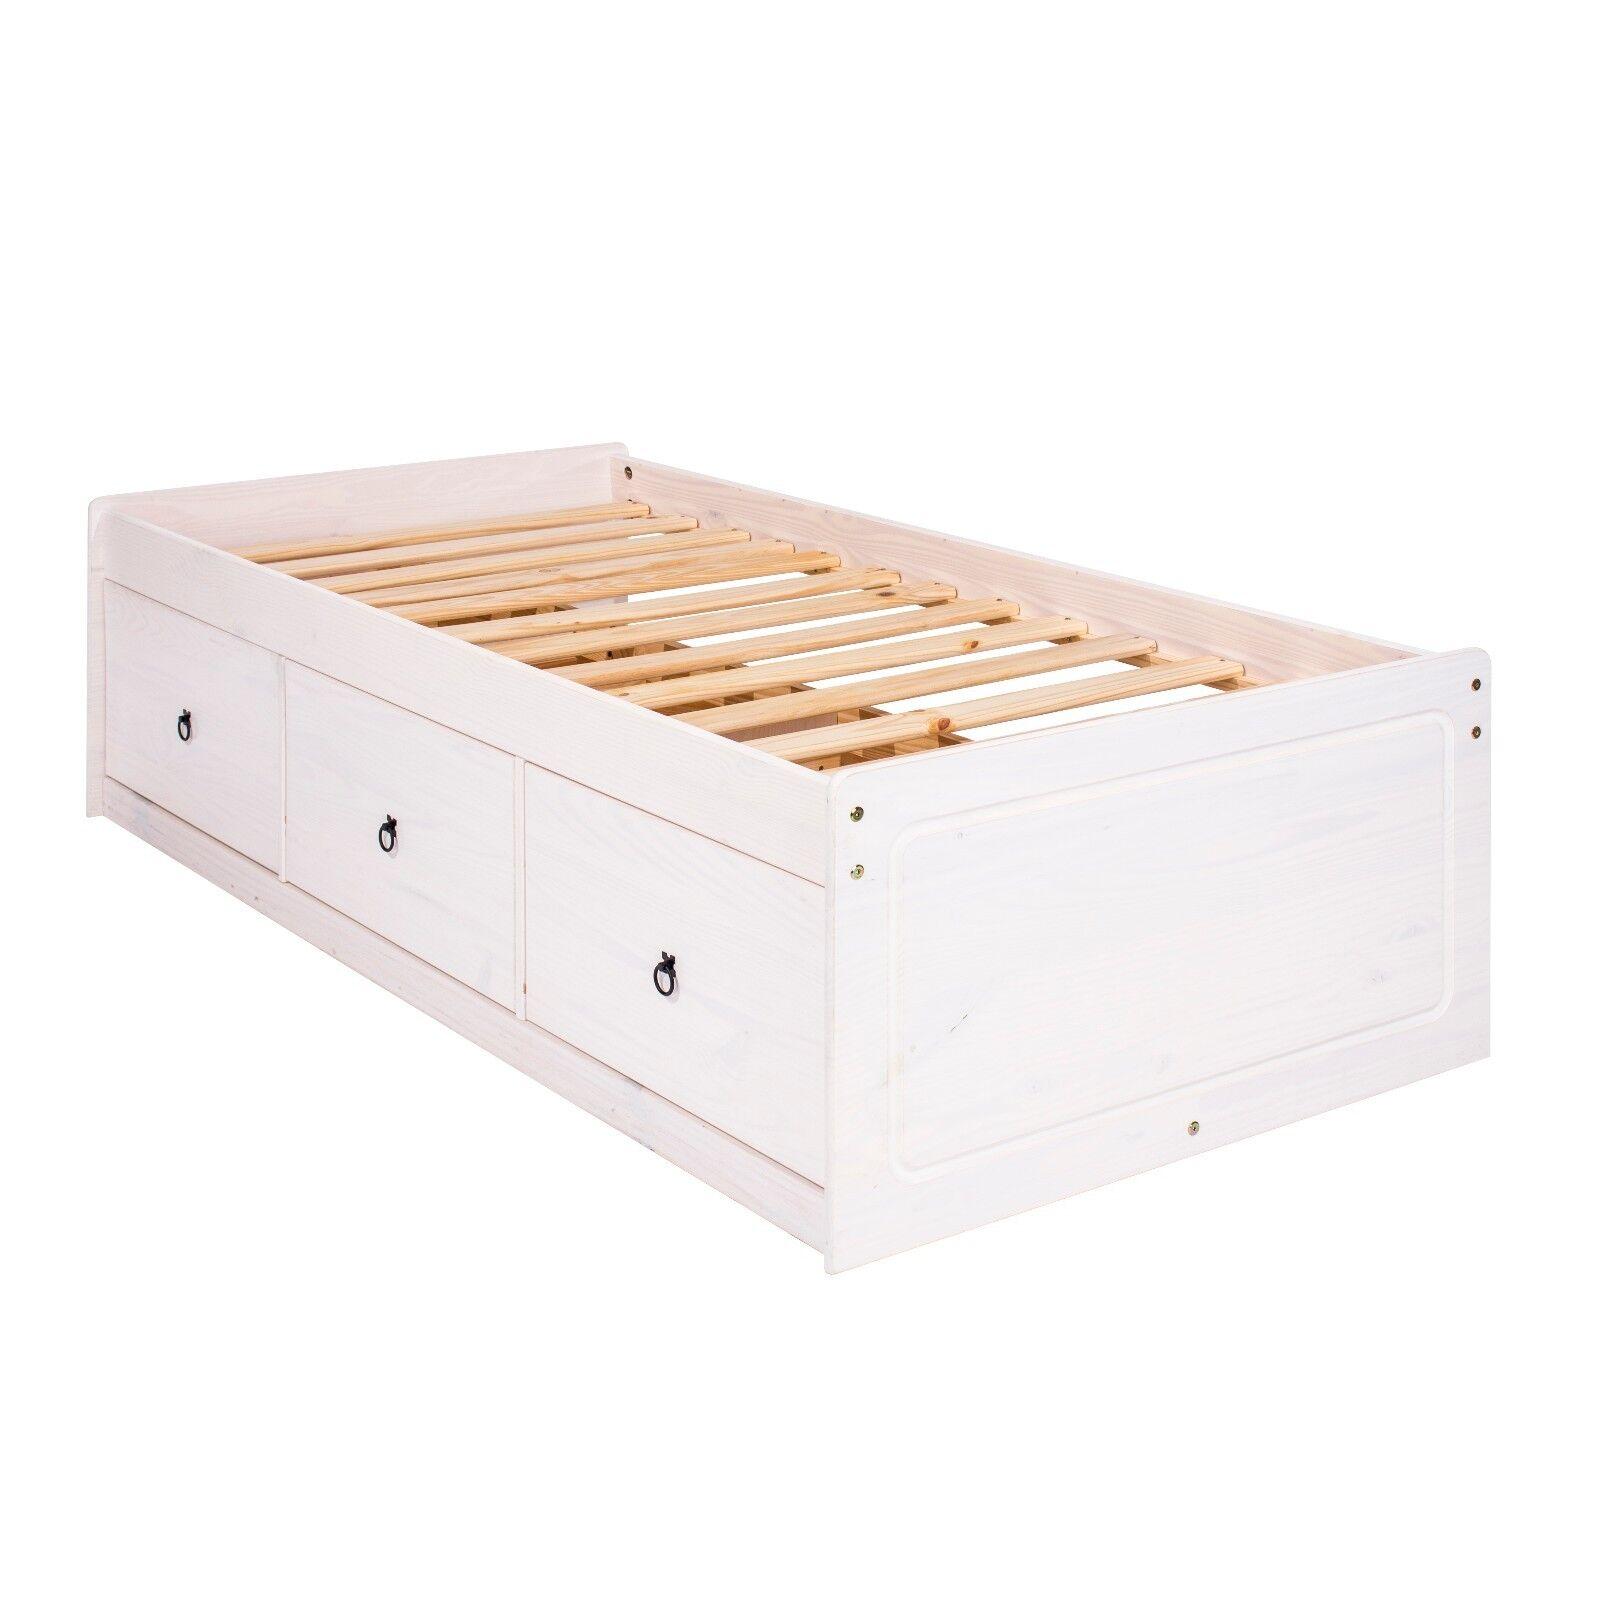 Corona Single cabin bed 3 drawers storage - Corona white home bedroom furniture  sc 1 st  eBay & Corona Single cabin bed 3 drawers storage - Corona white home ...